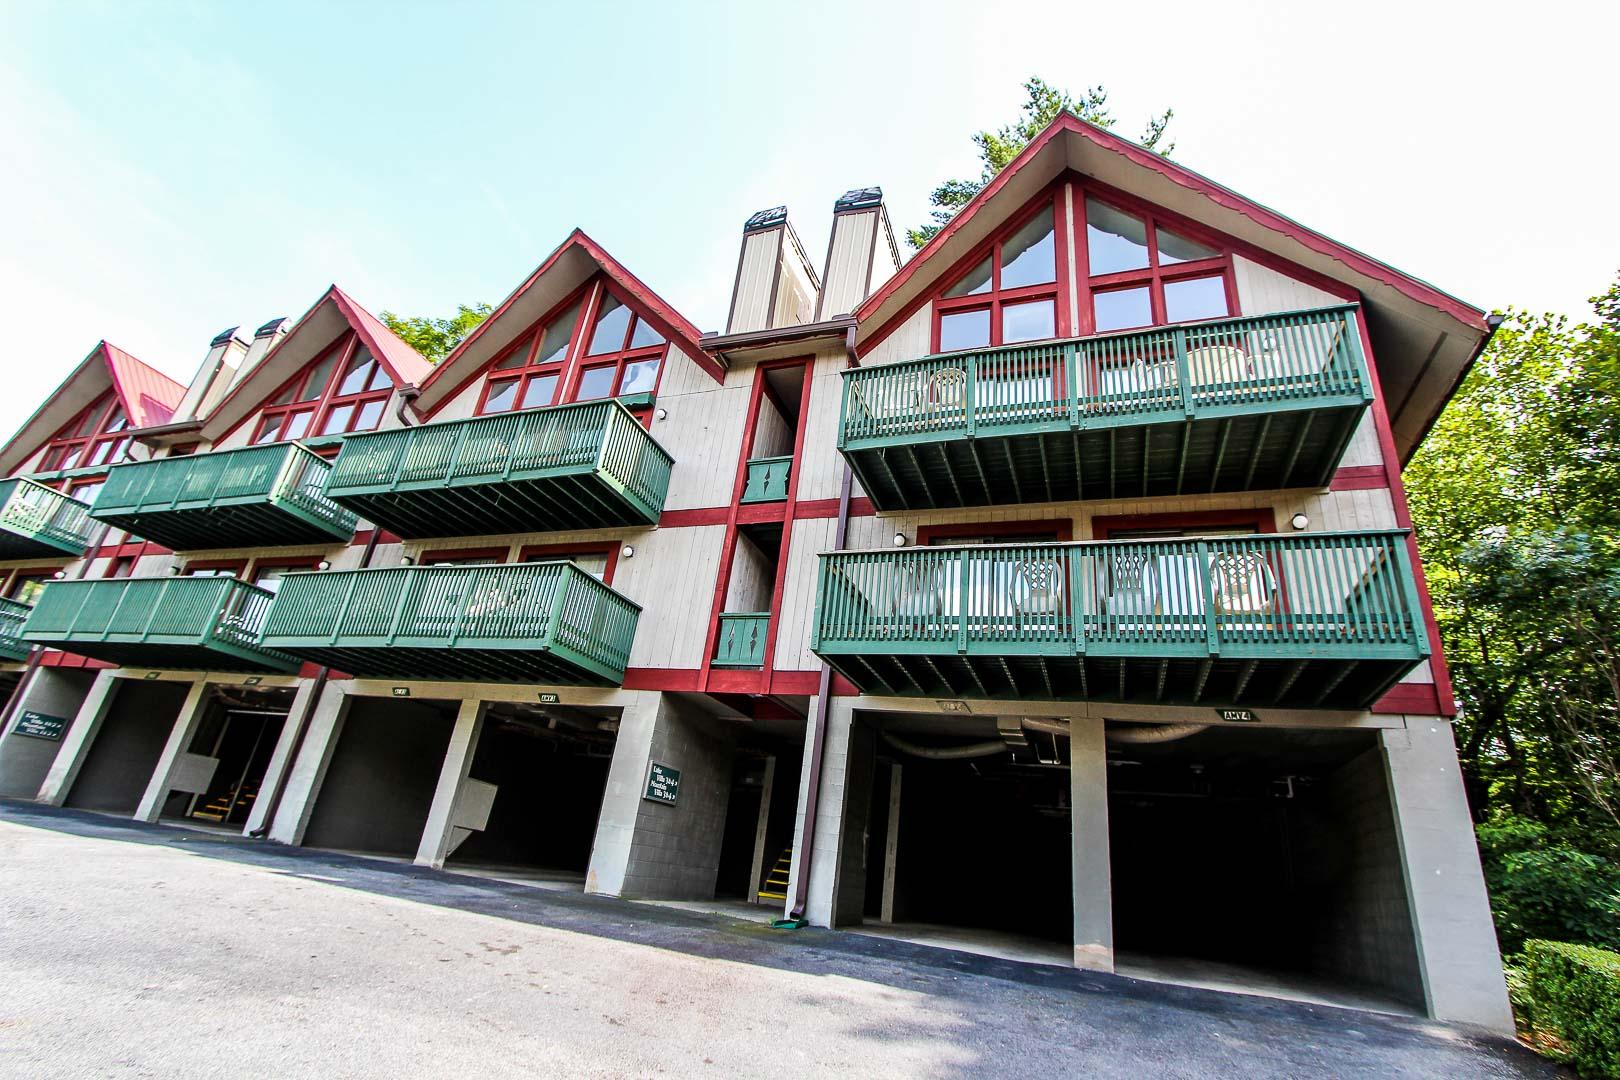 A stoic resort building at VRI's Alpine Crest Resort in Georgia.